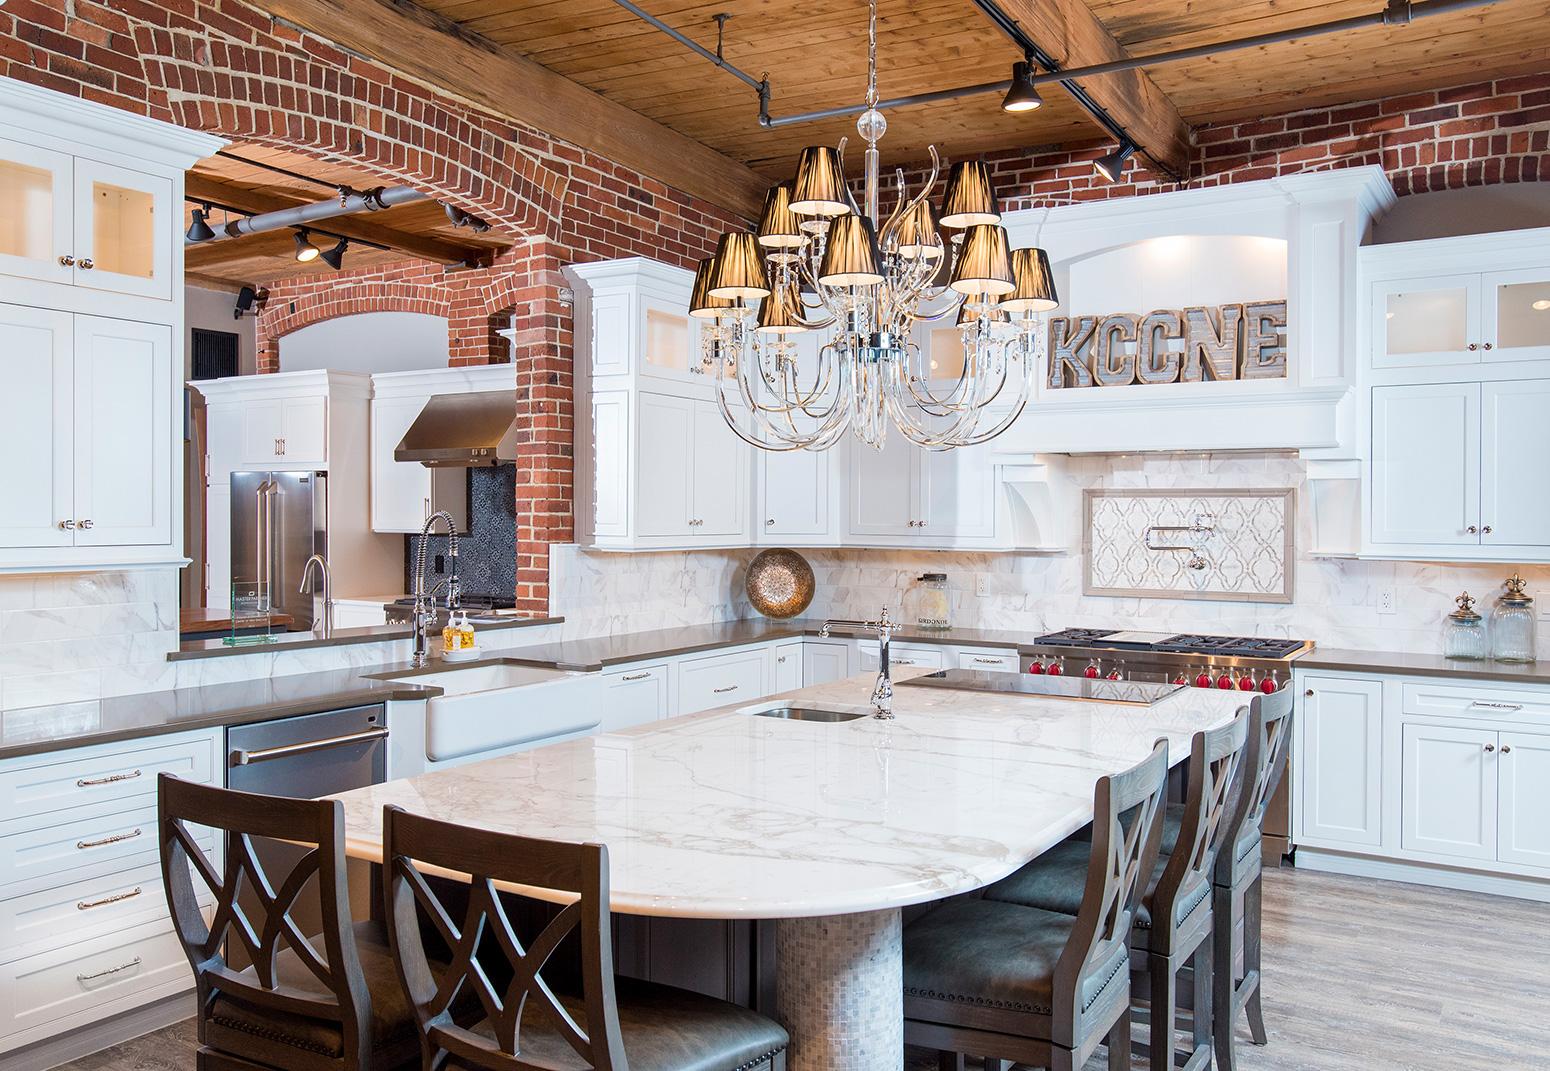 Kccne In Pawtucket Rhode Island Kitchen Countertop